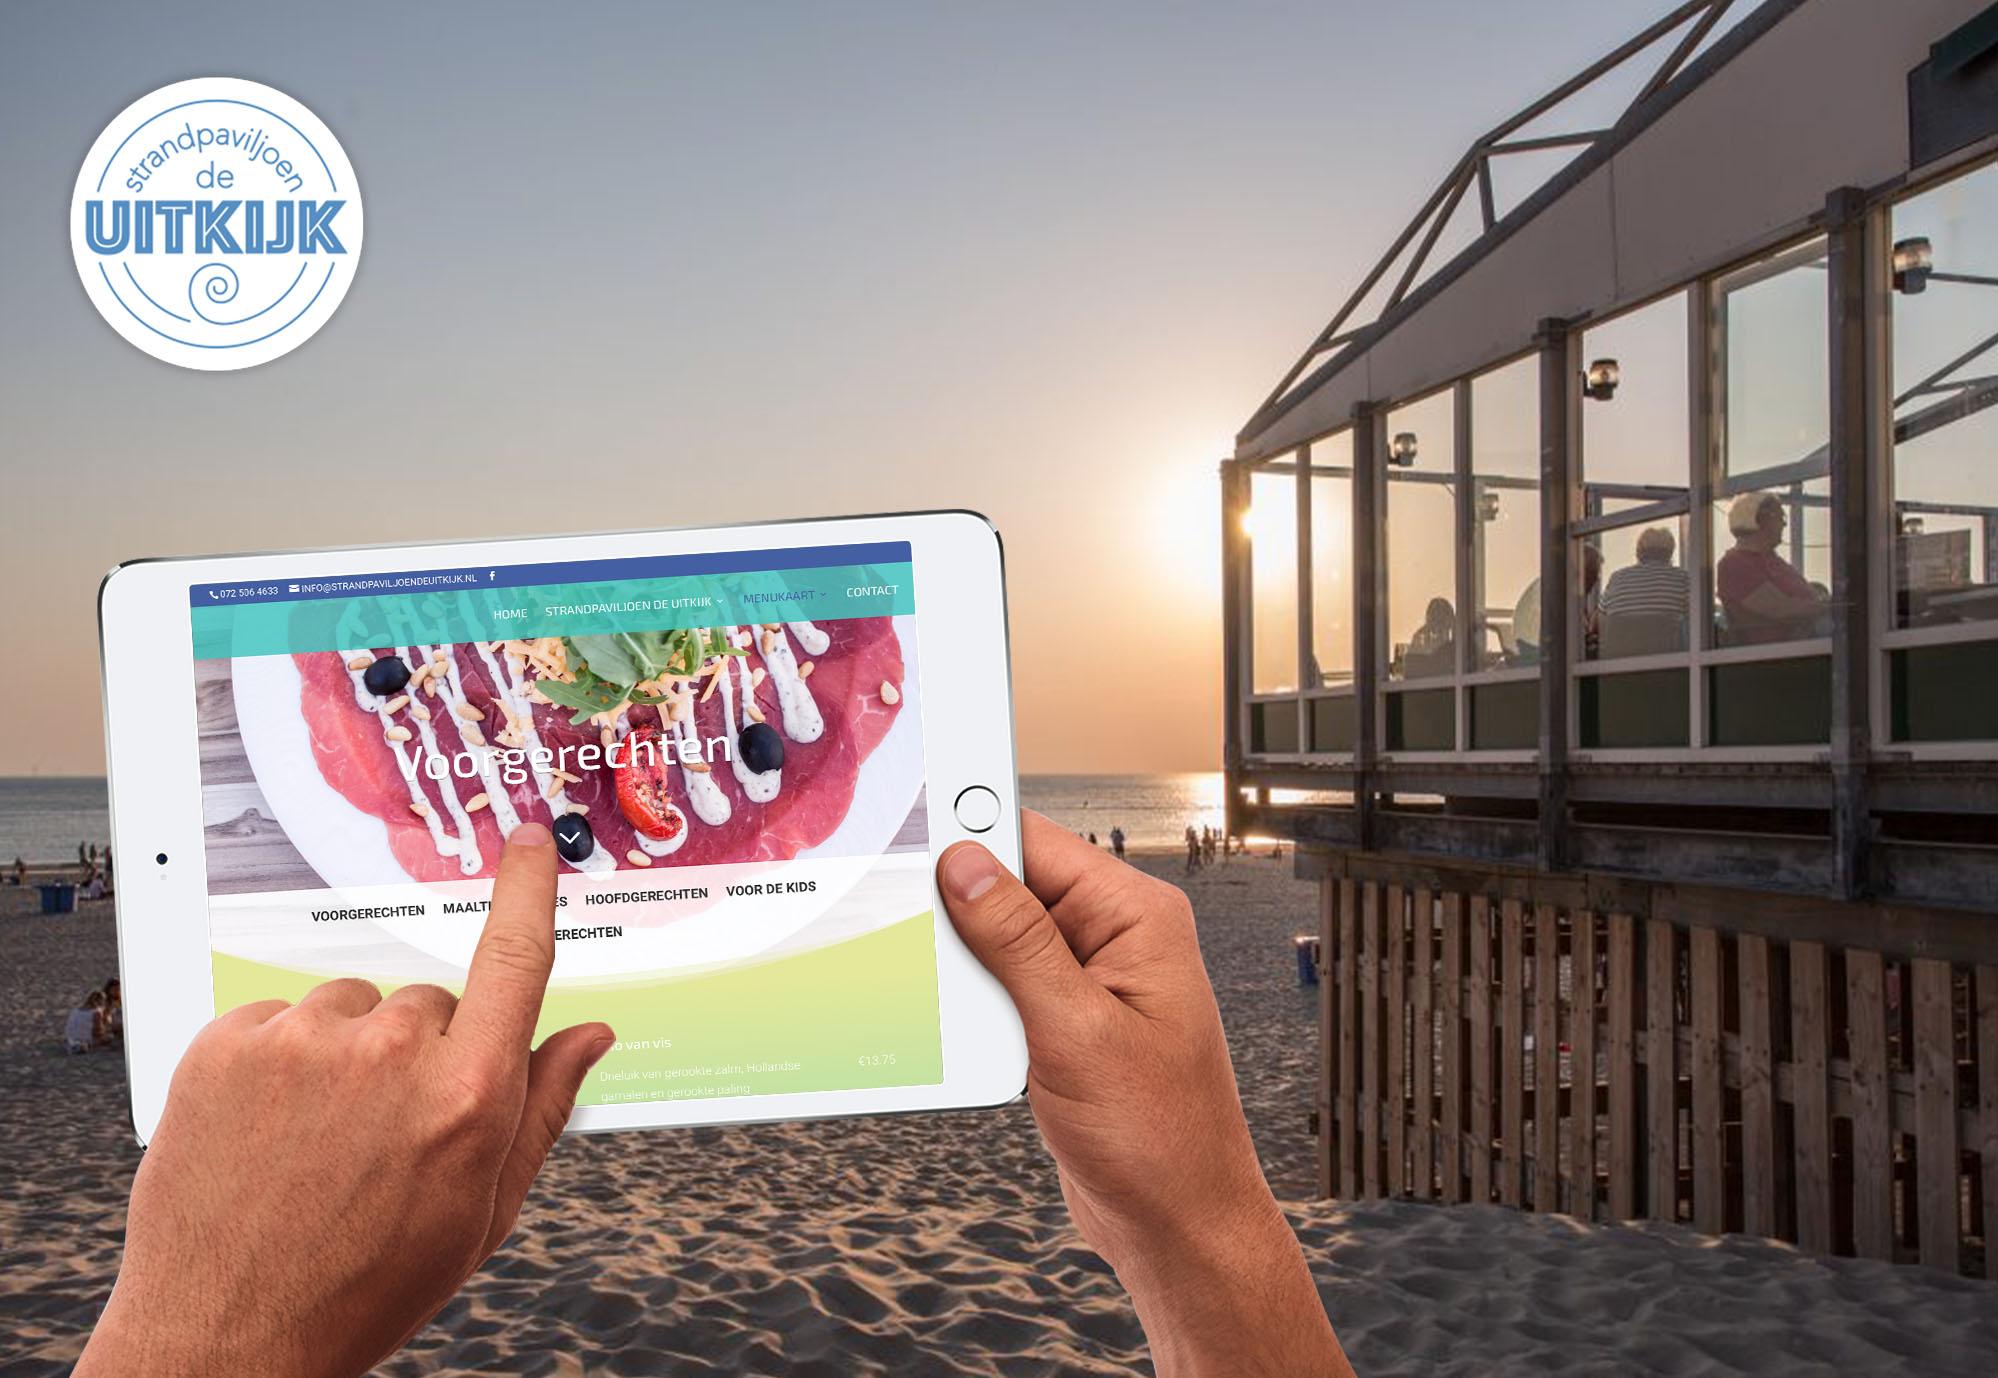 strandpaviljoen de uitkijk portfolio2